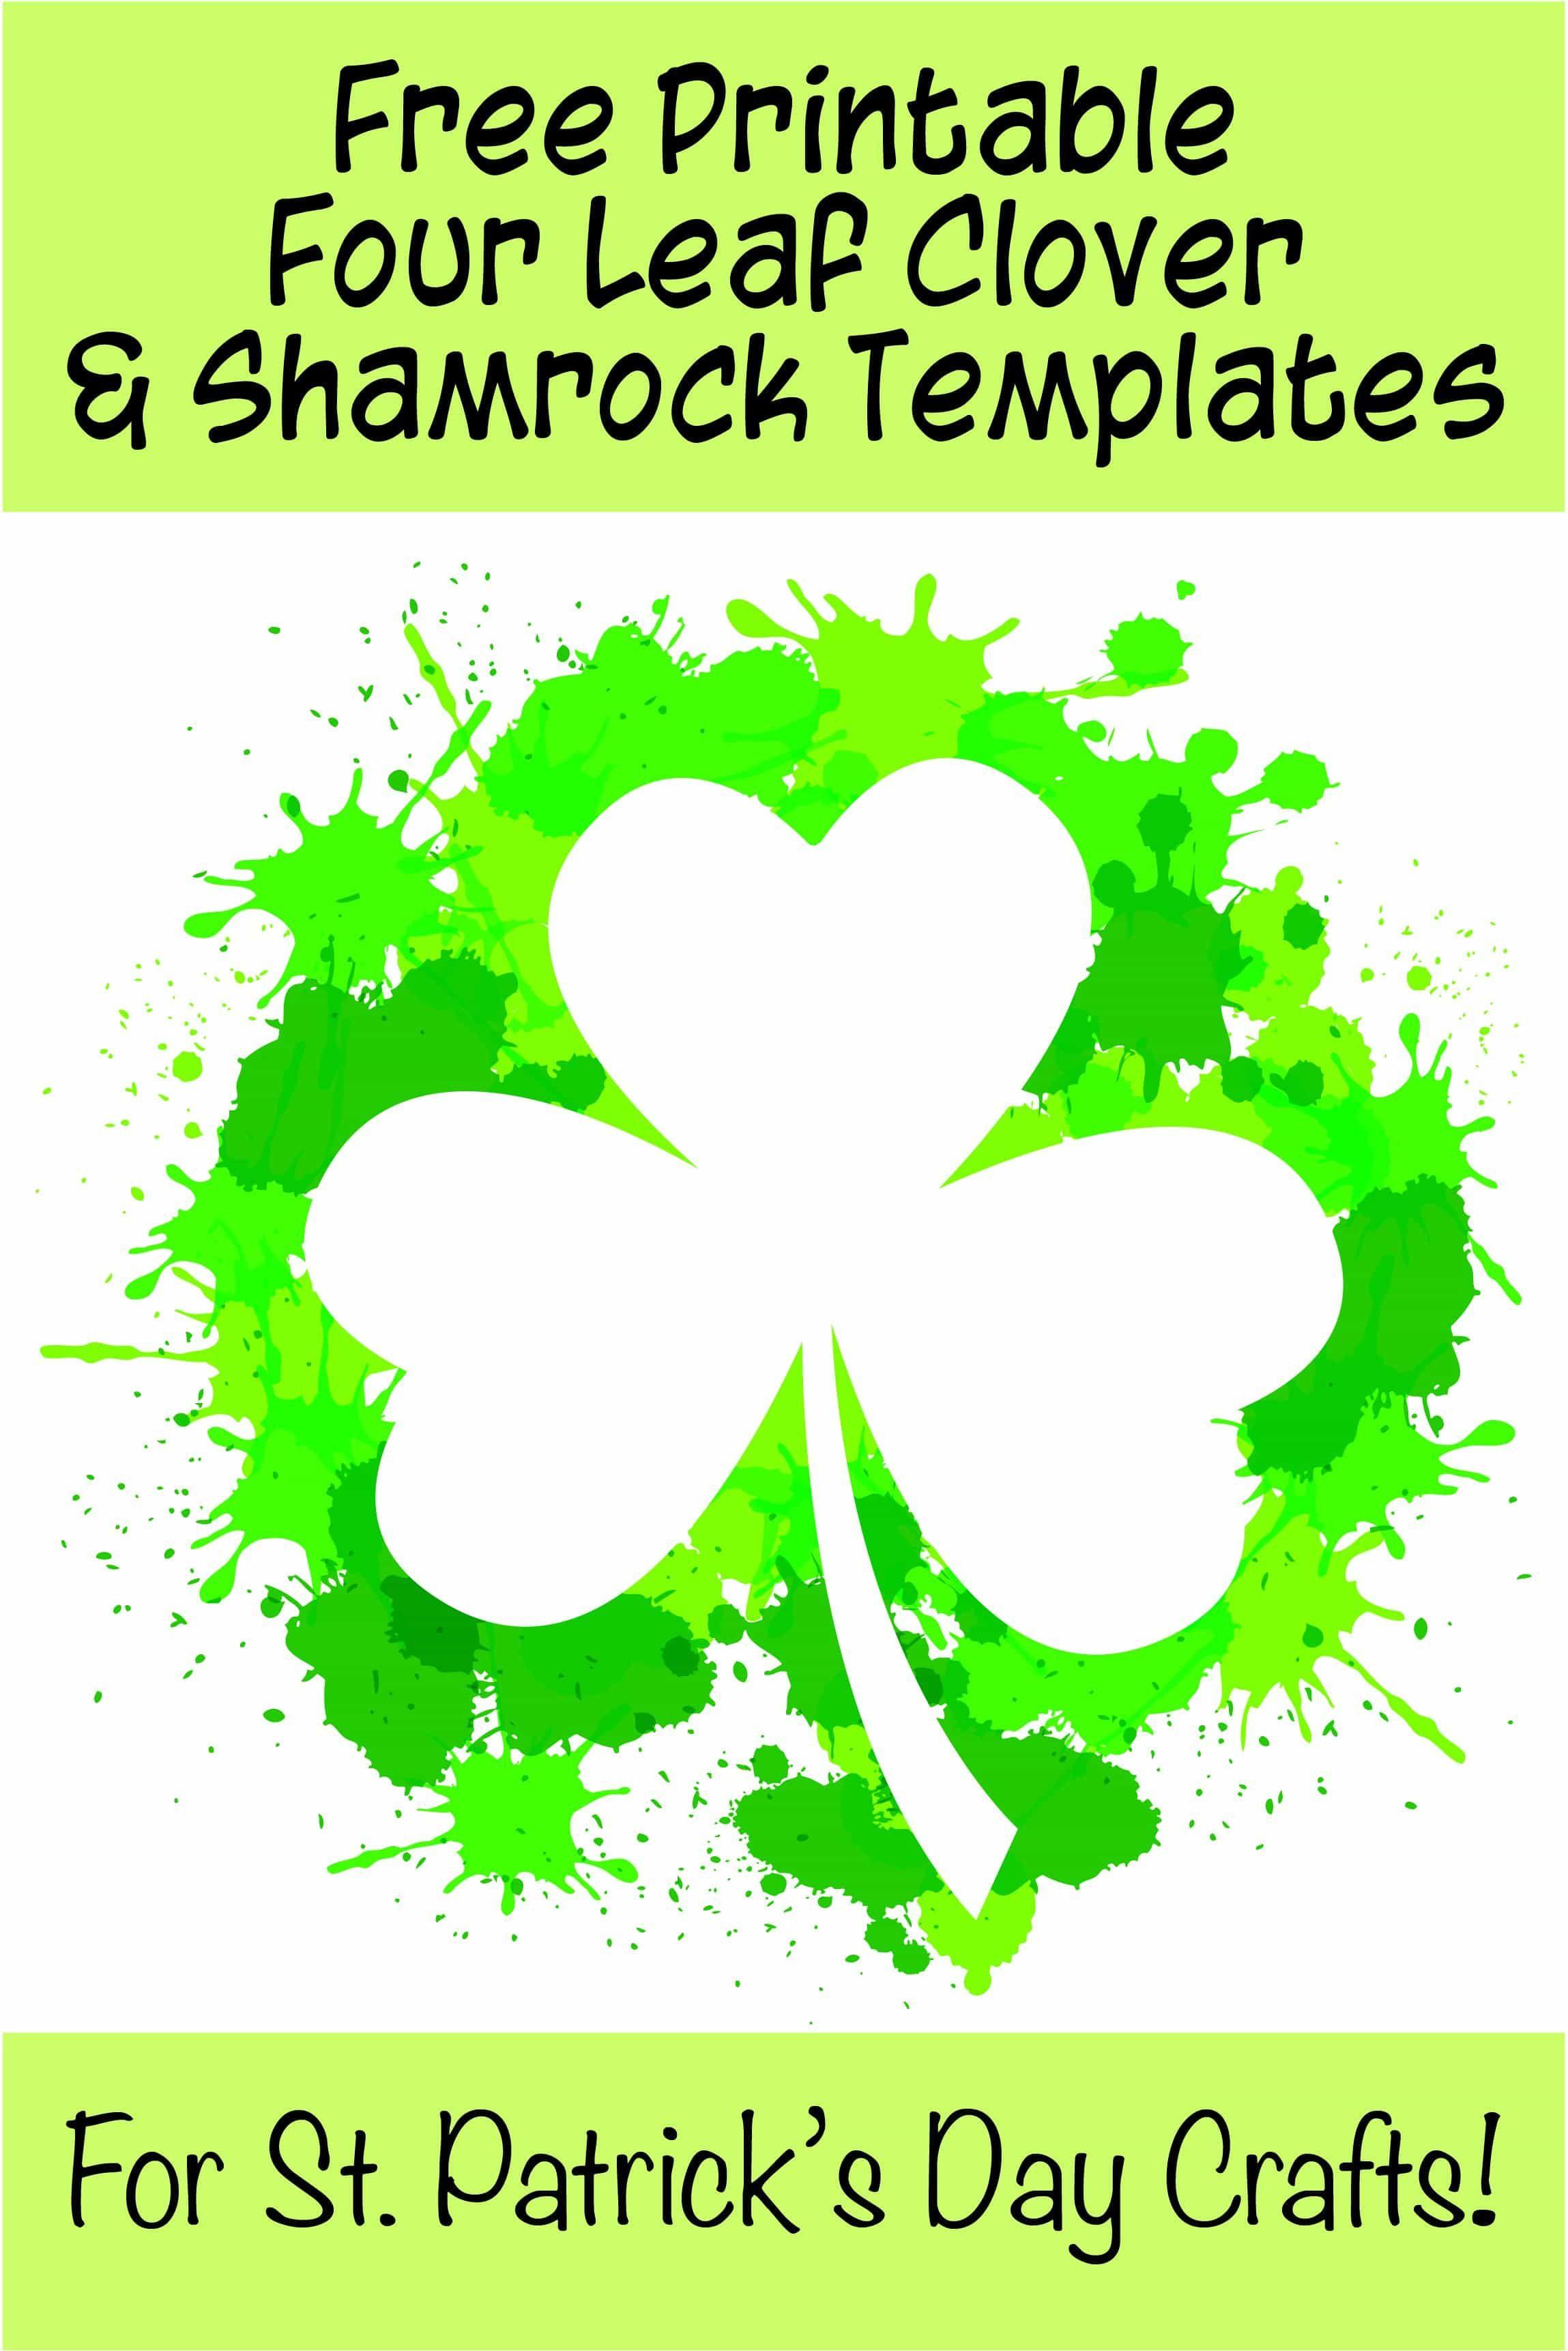 15 Free Printable Four Leaf Clover Amp Shamrock Templates